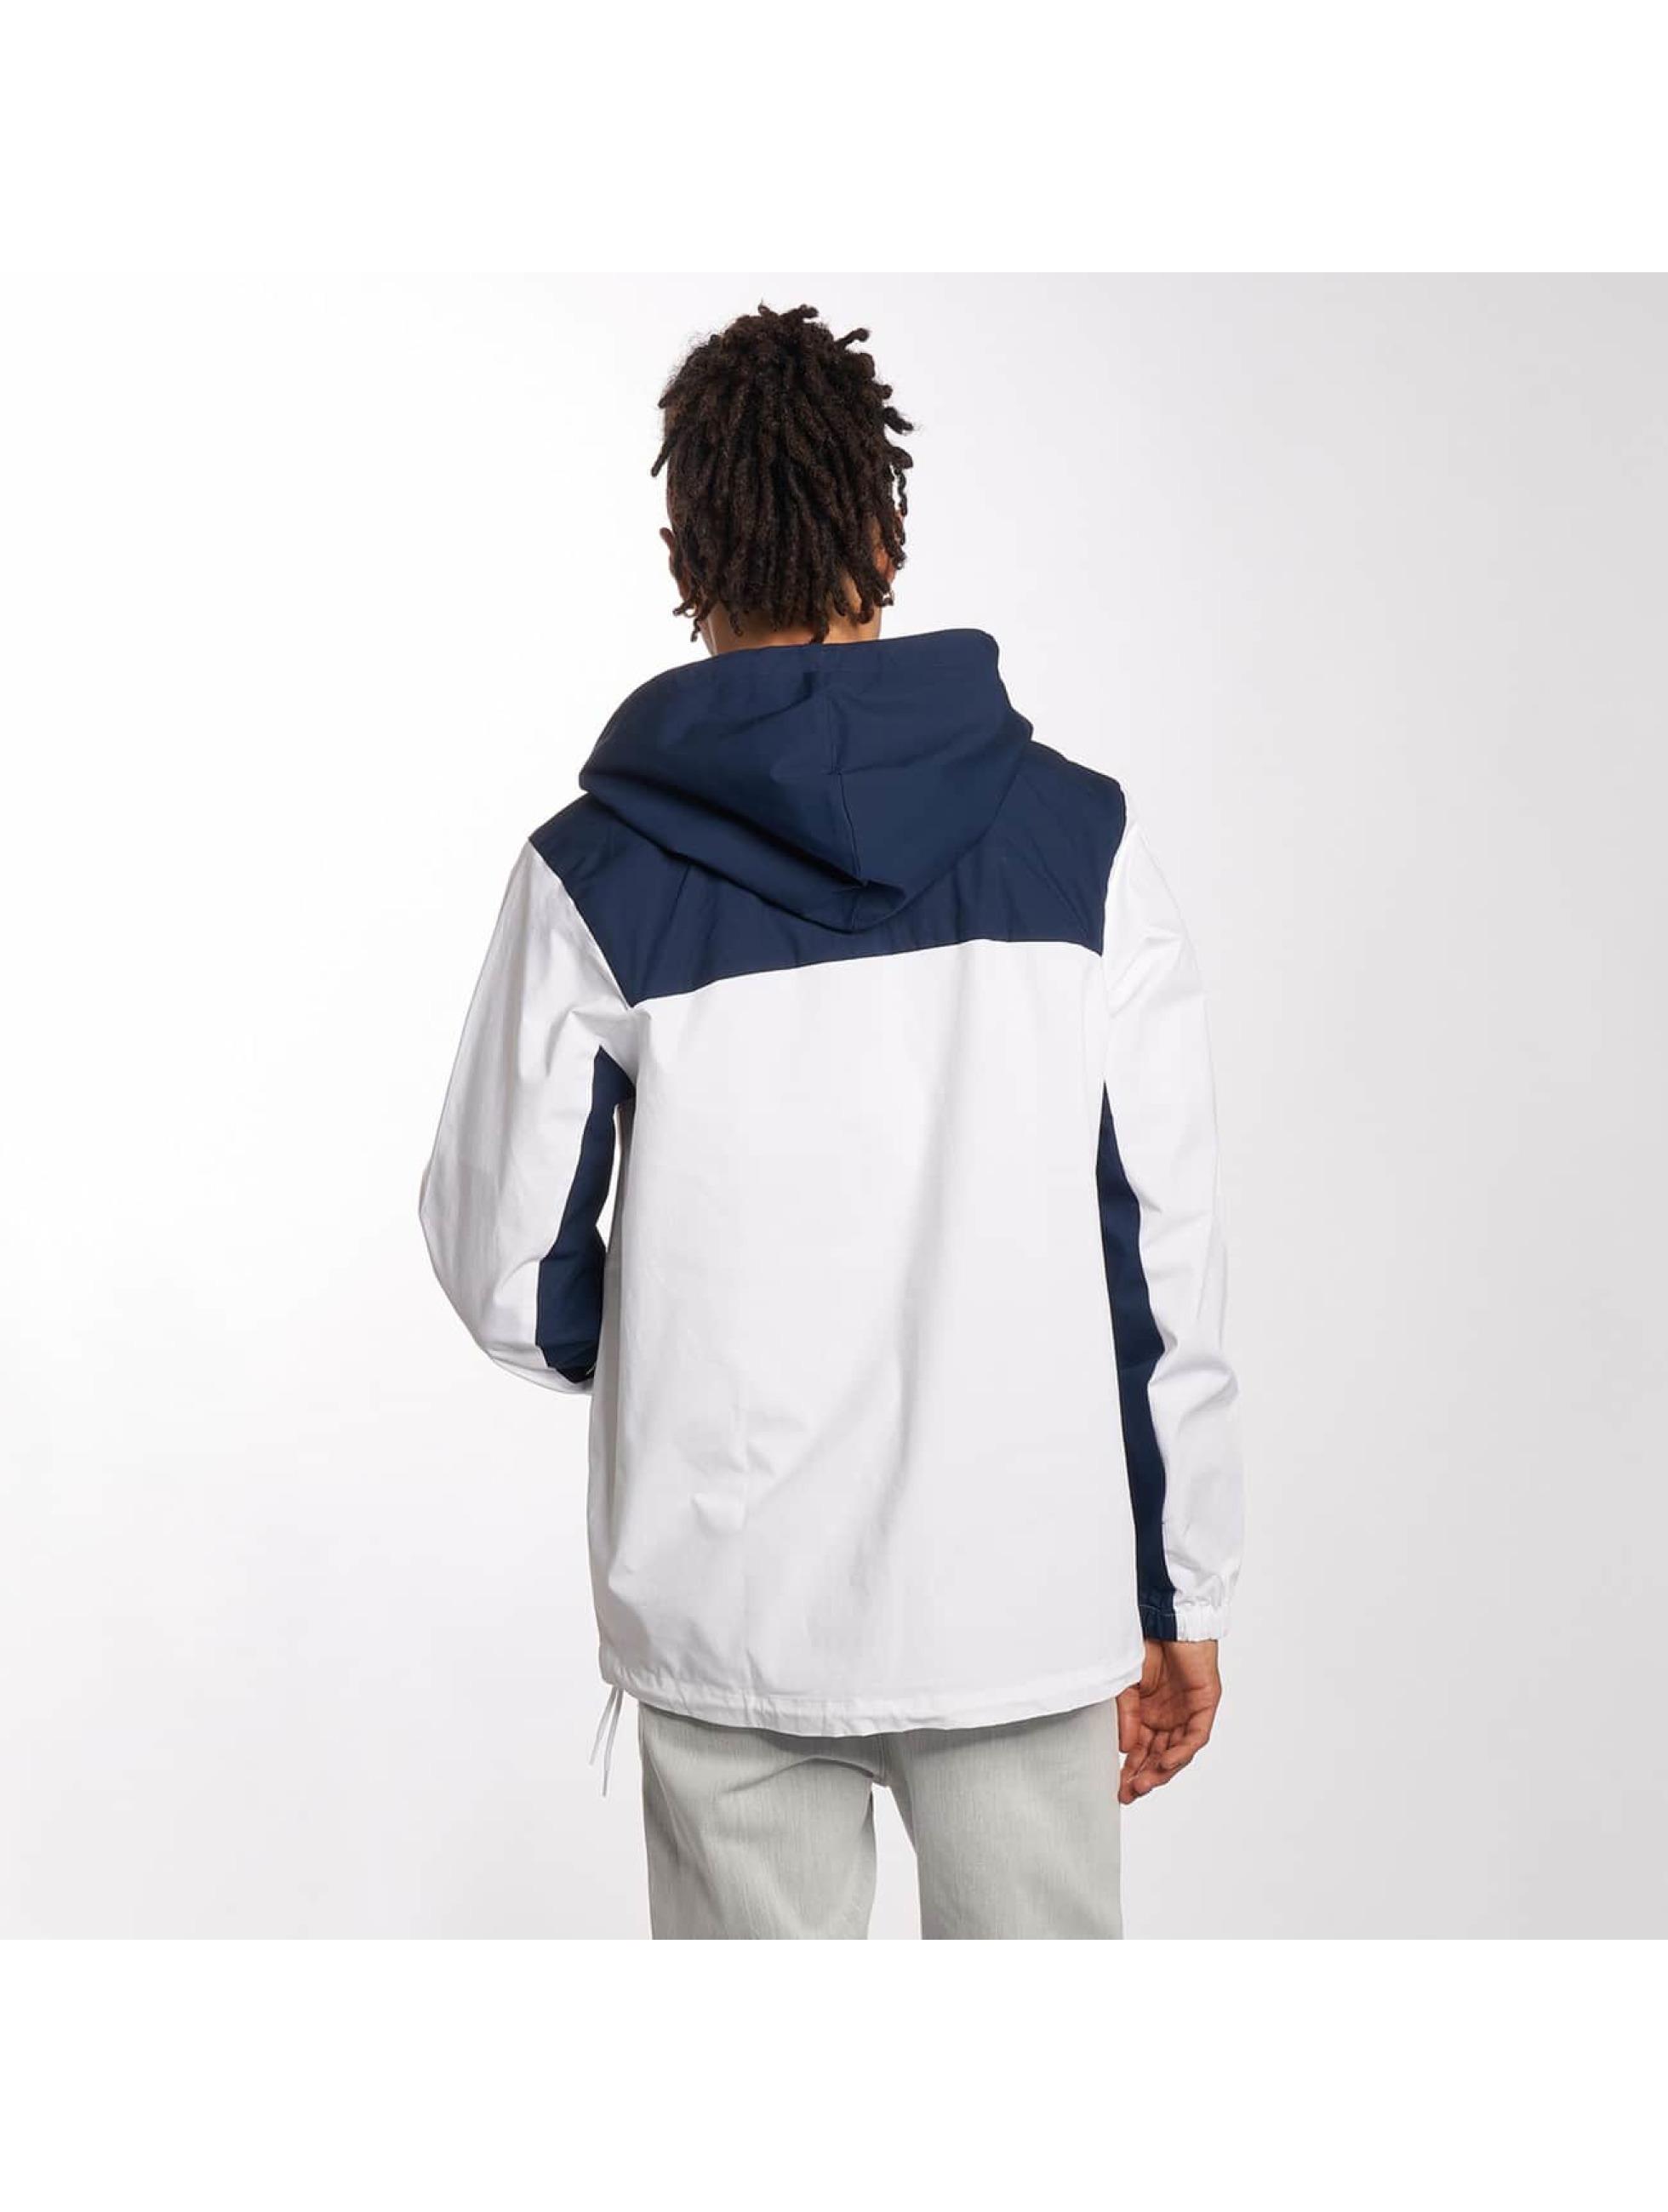 Reebok Transitional Jackets FZ hvit